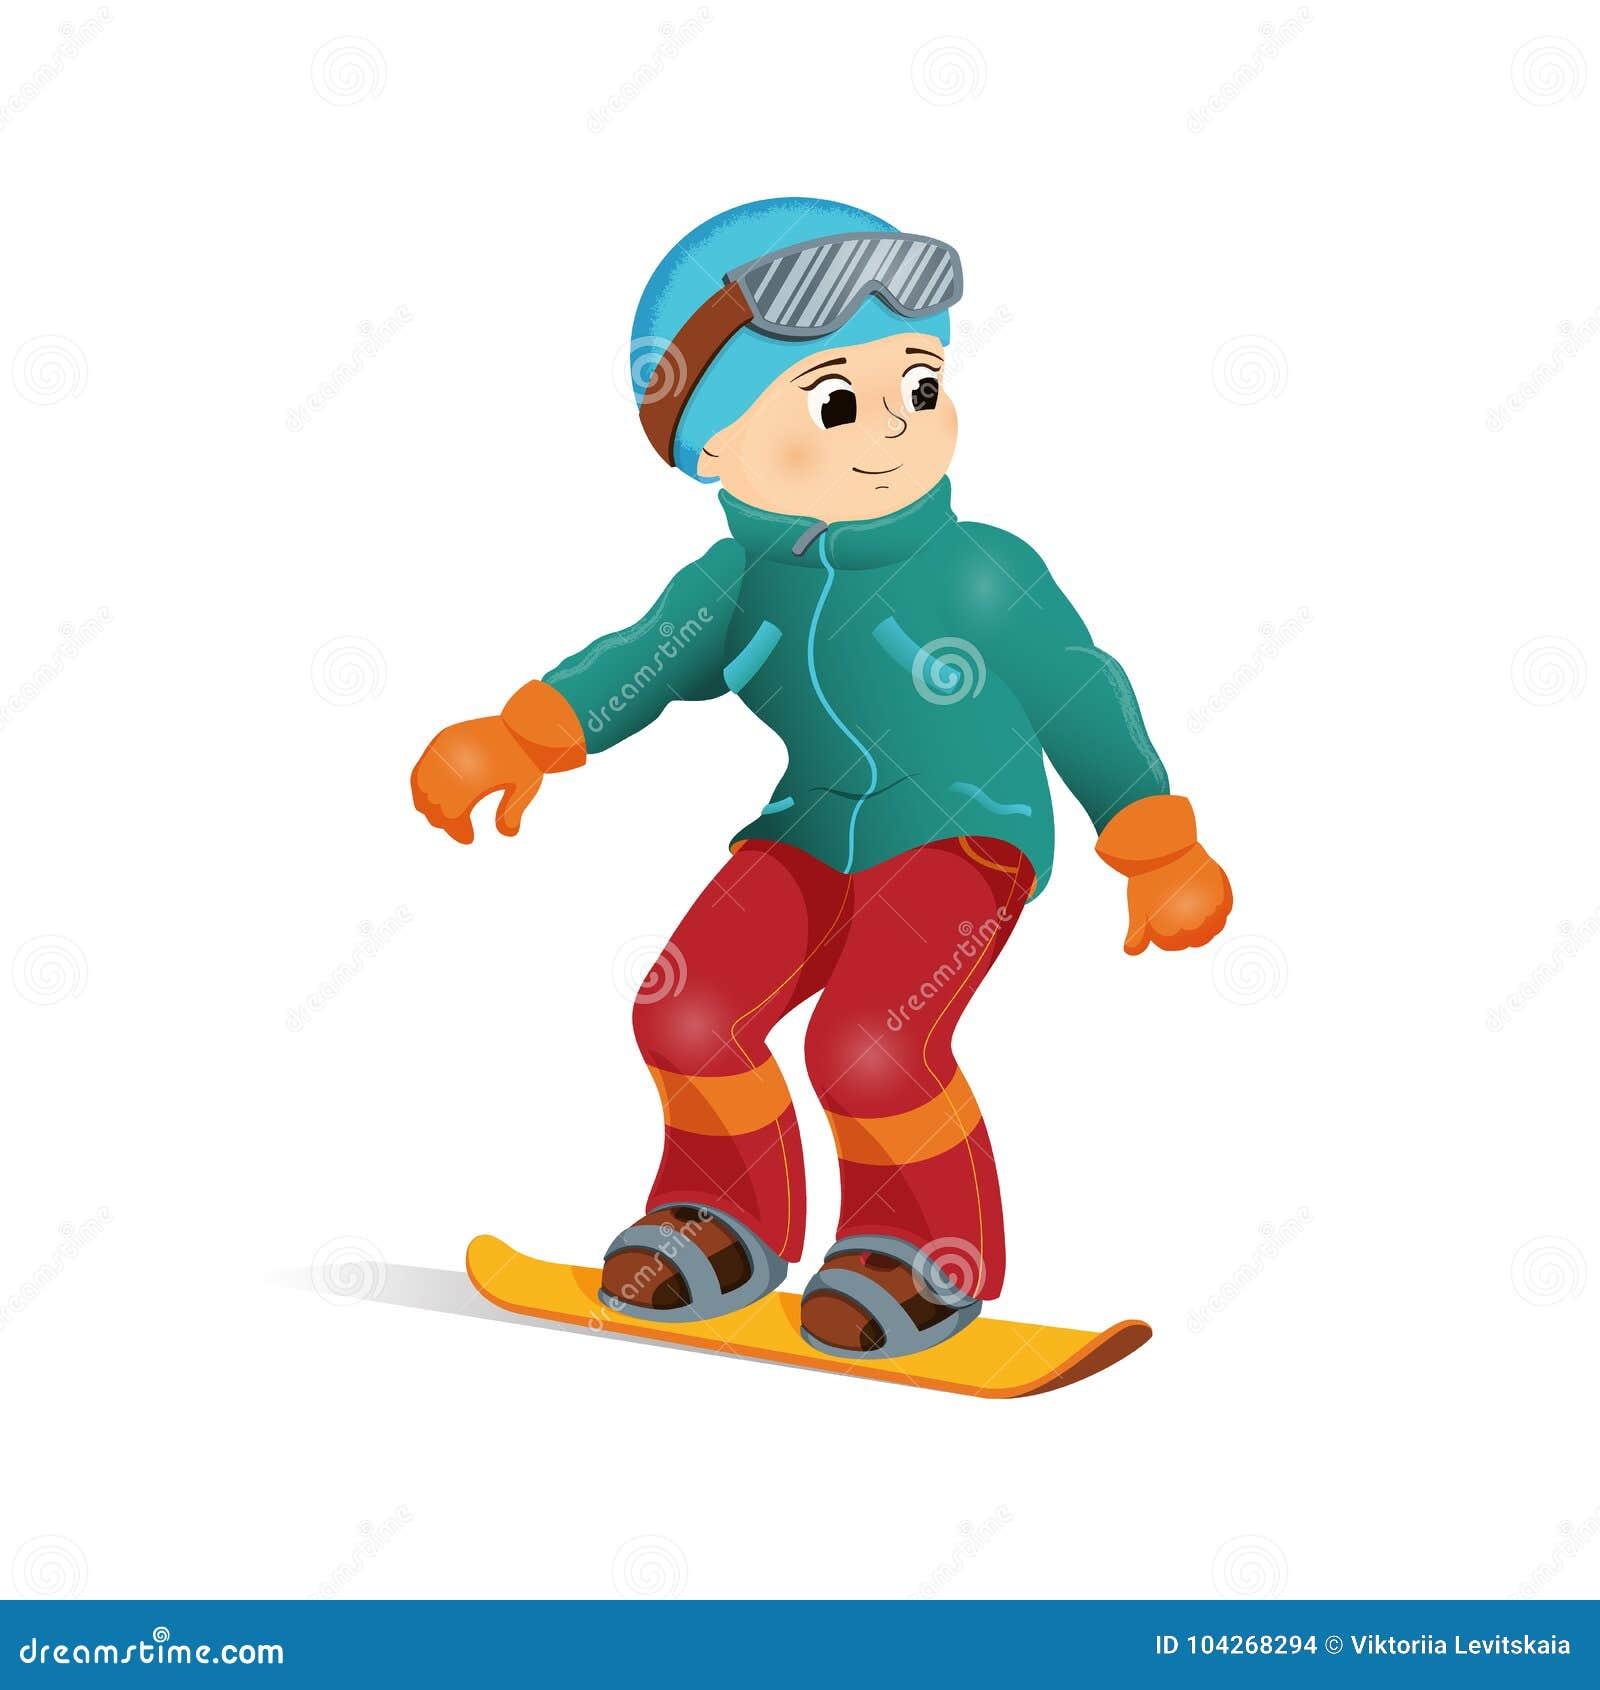 c0830b16155 Happy boy in warm clothes snowboarding downhill